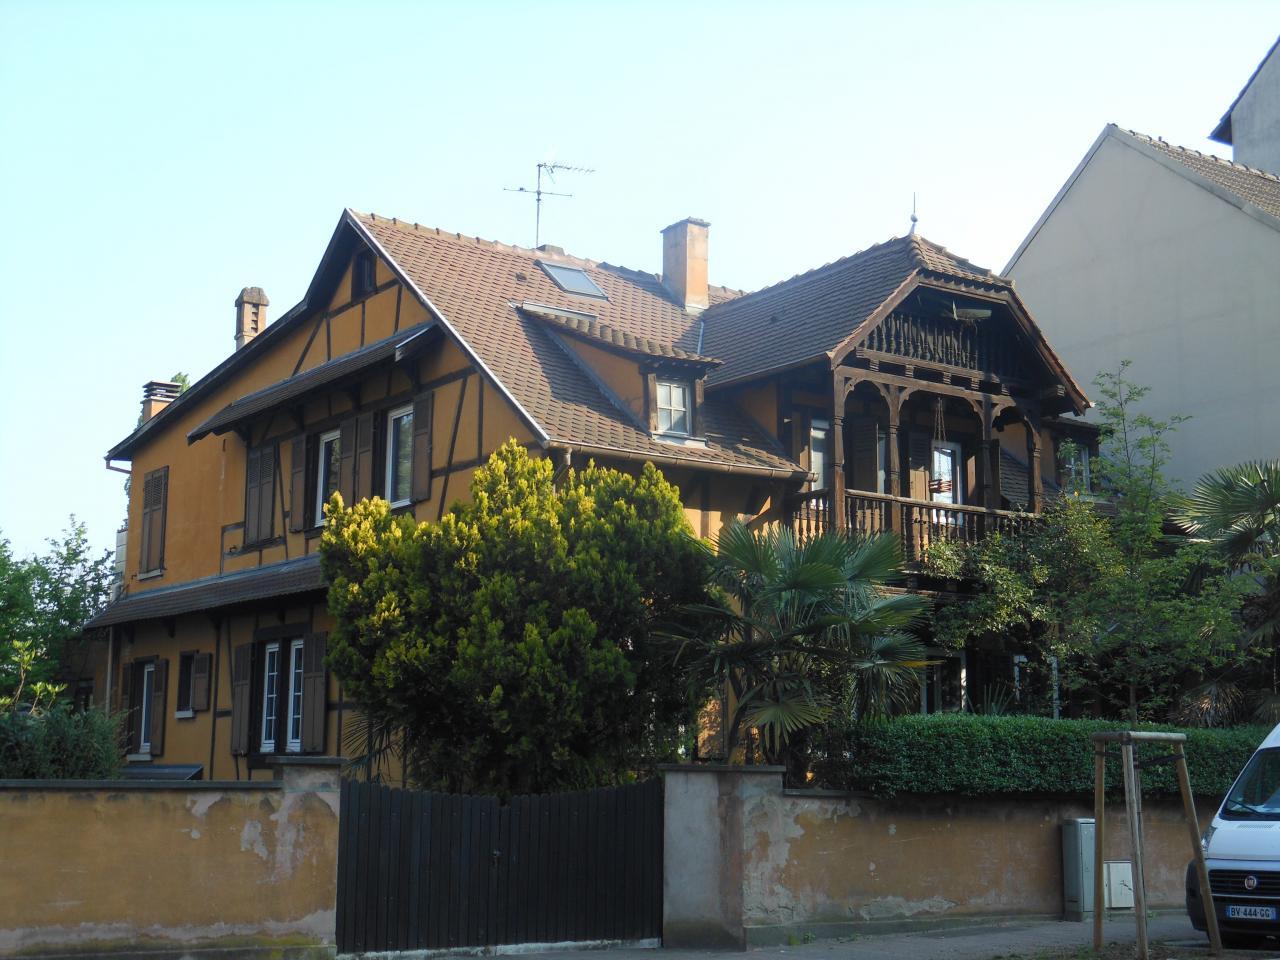 Maison de glacis